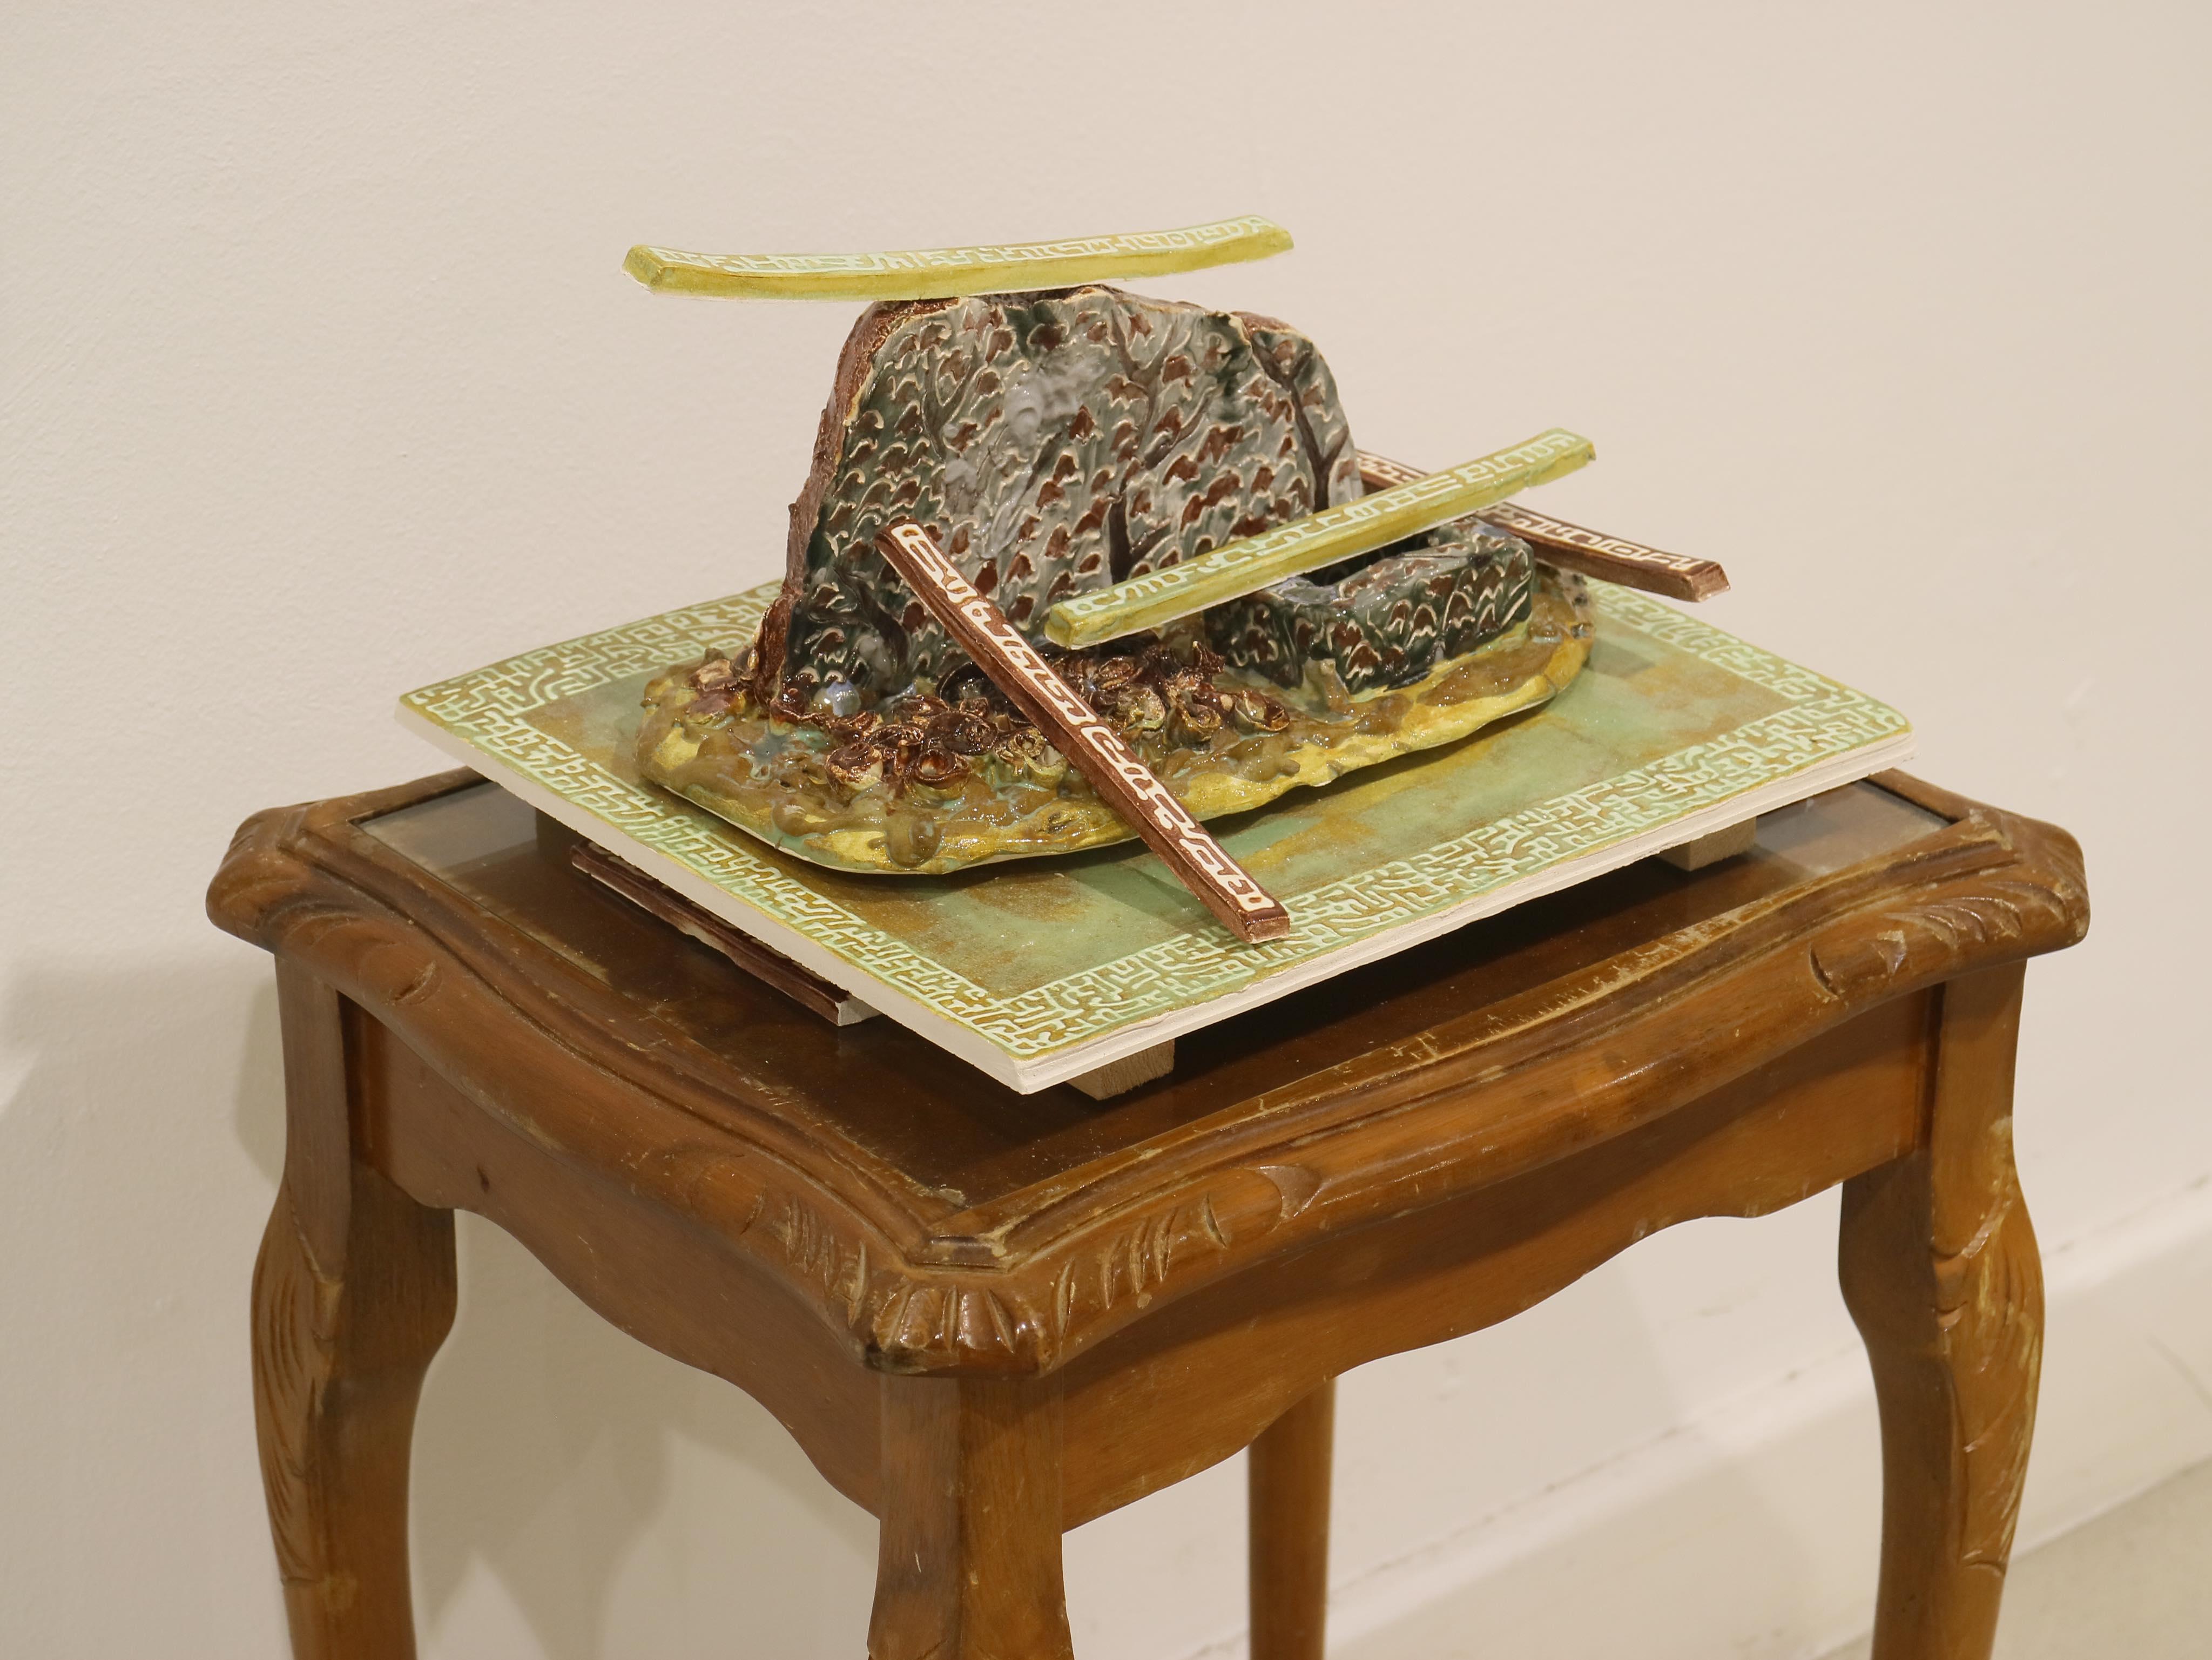 Kara Chin, Sticks on a Hill, 2020. Glazed ceramic. 20 x 25 x 20 cm.